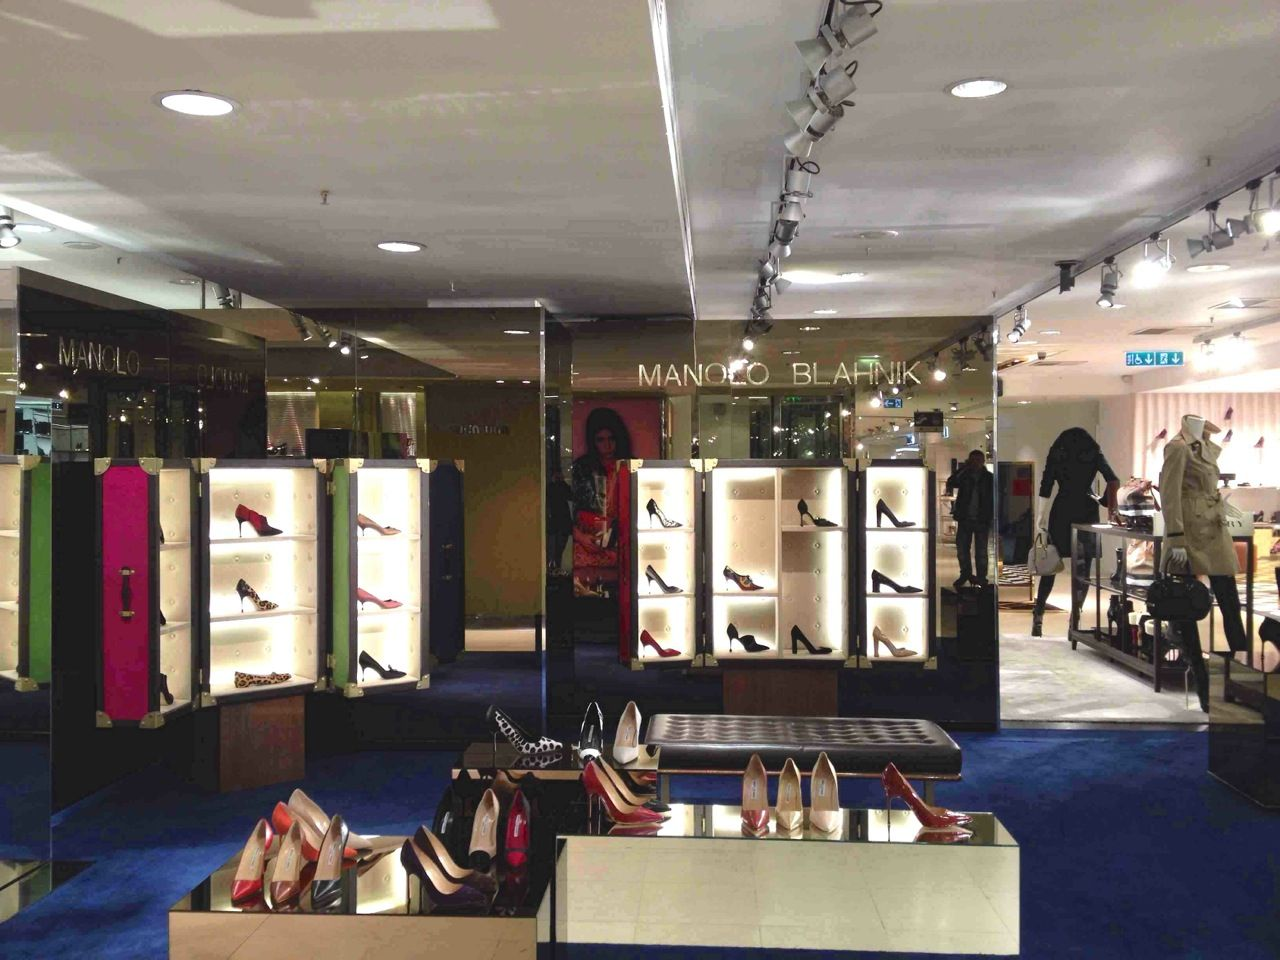 Manolo Blahnik -  Chaussures Apr!s travaux !  fashion  Printemps  Paris 65c376d6daa4